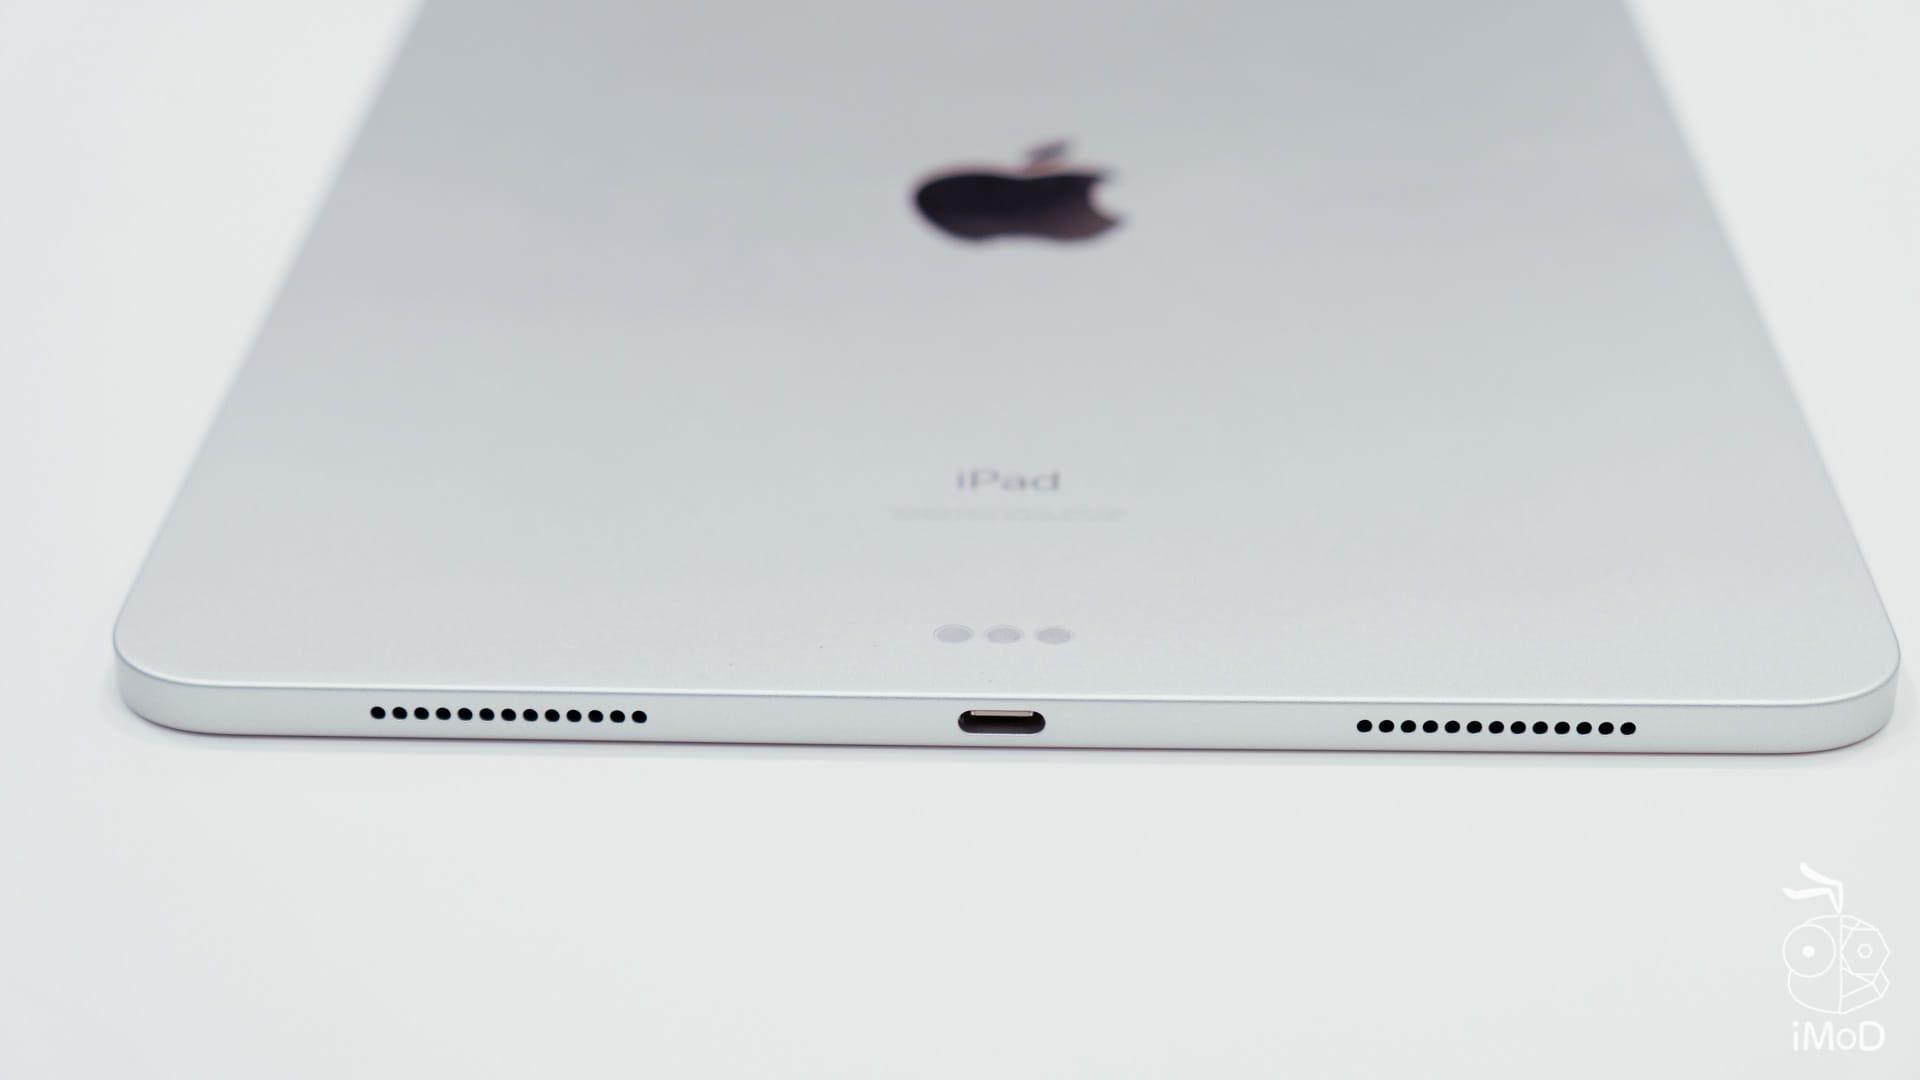 Ipad Pro Macbook Air 2018 Studio7 2441